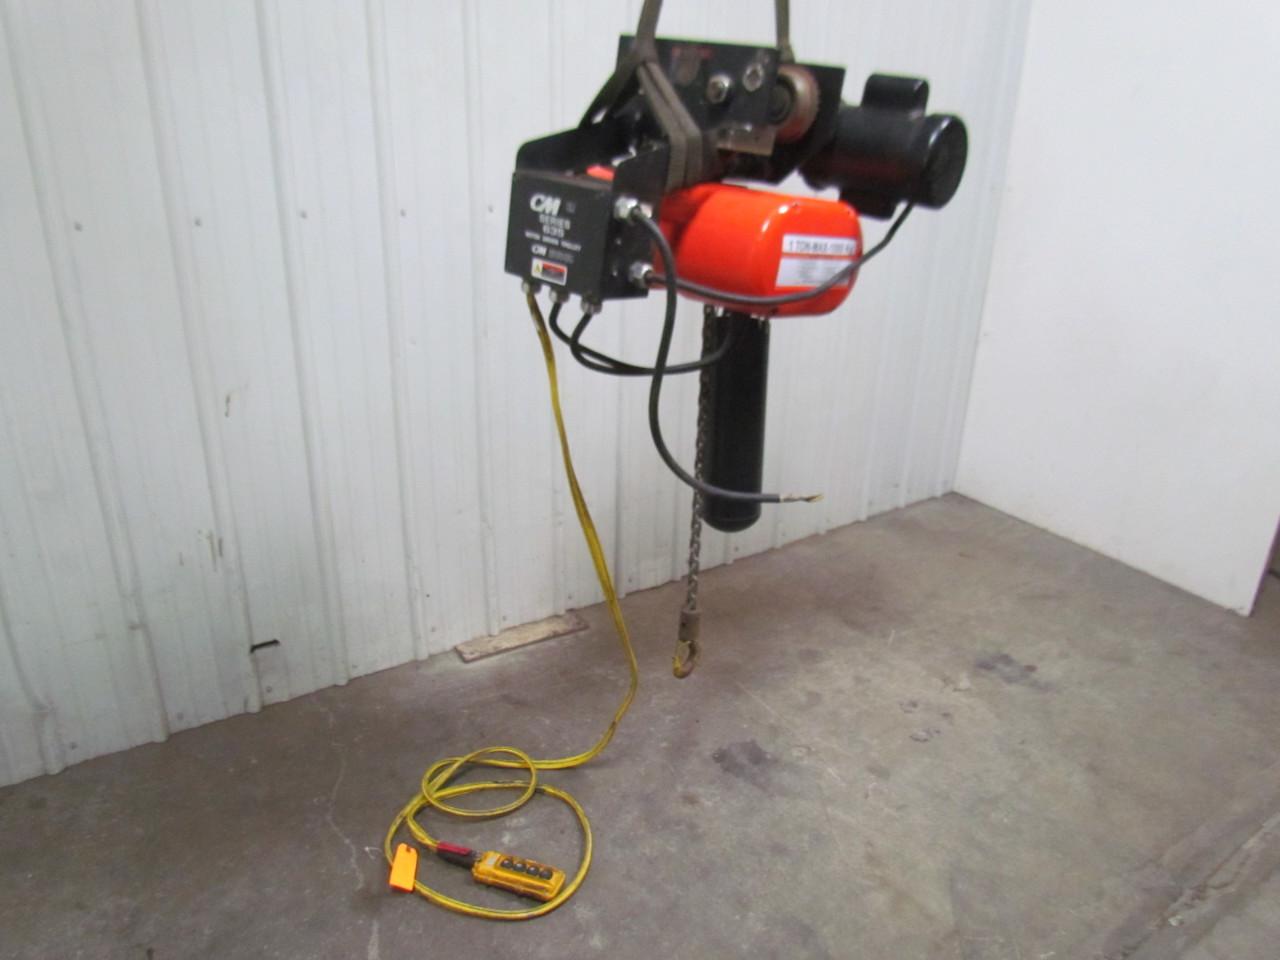 Cm Lodestar L 1 Ton Electric Chain Hoist 19 39 Lift 635 Motor